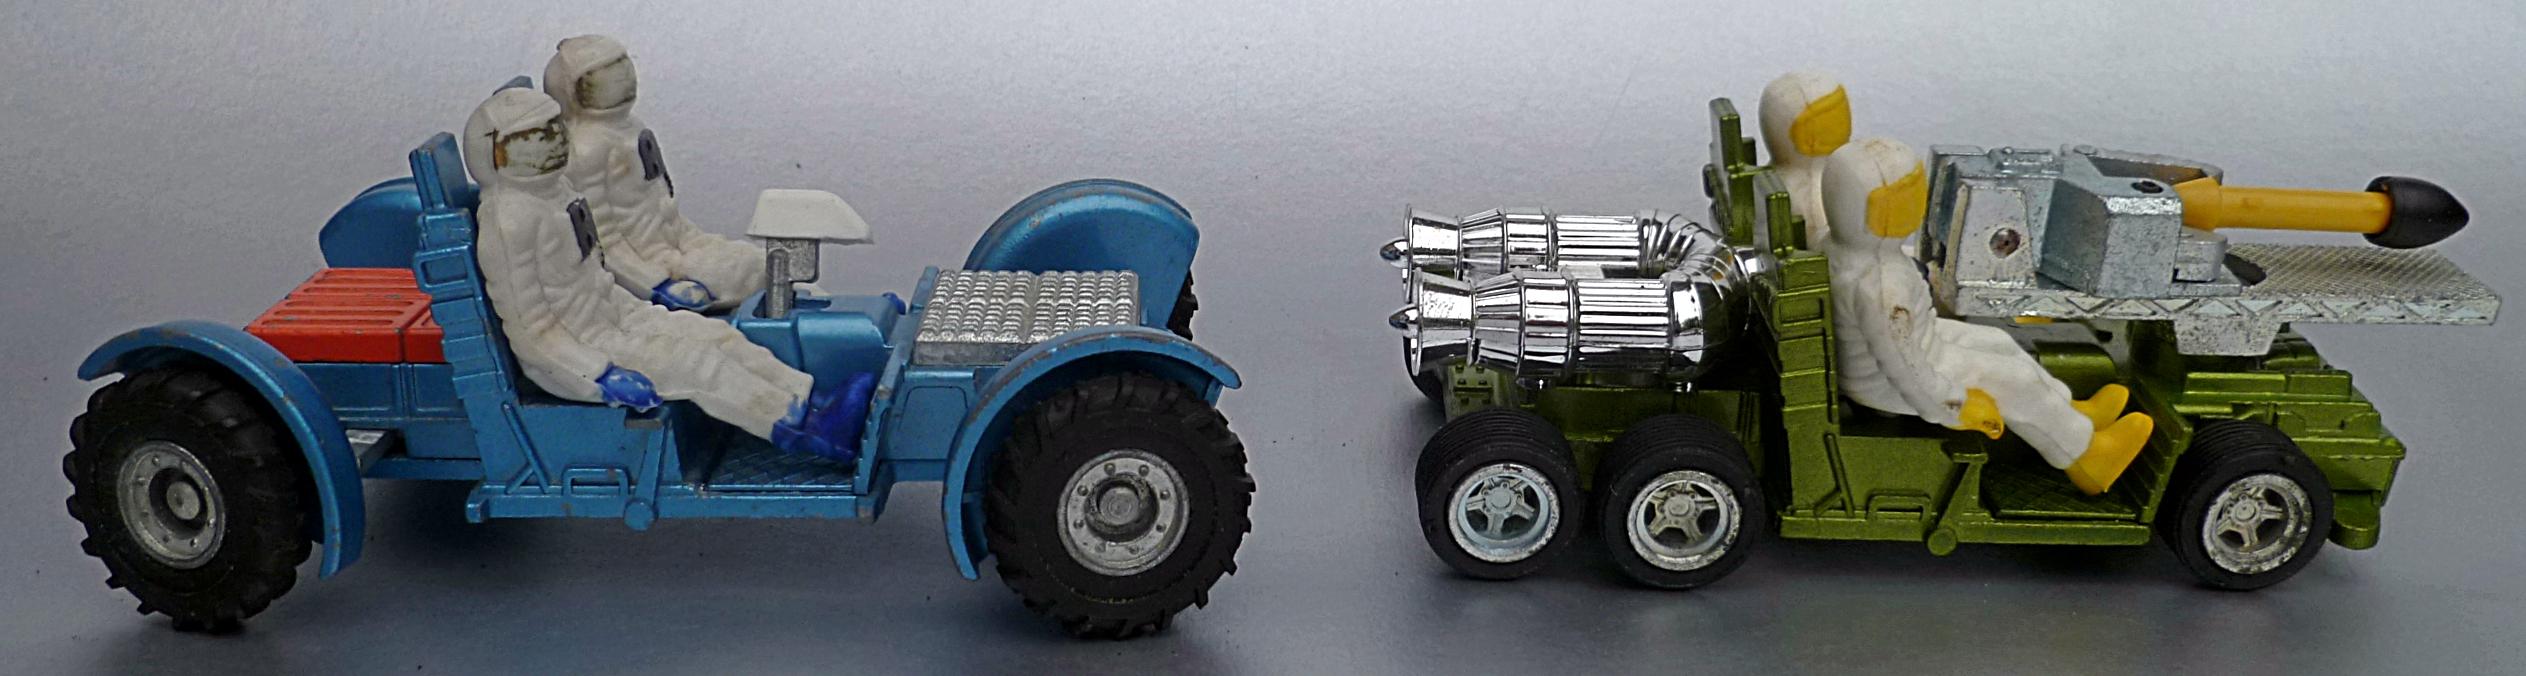 Parts LR WC 7.jpg